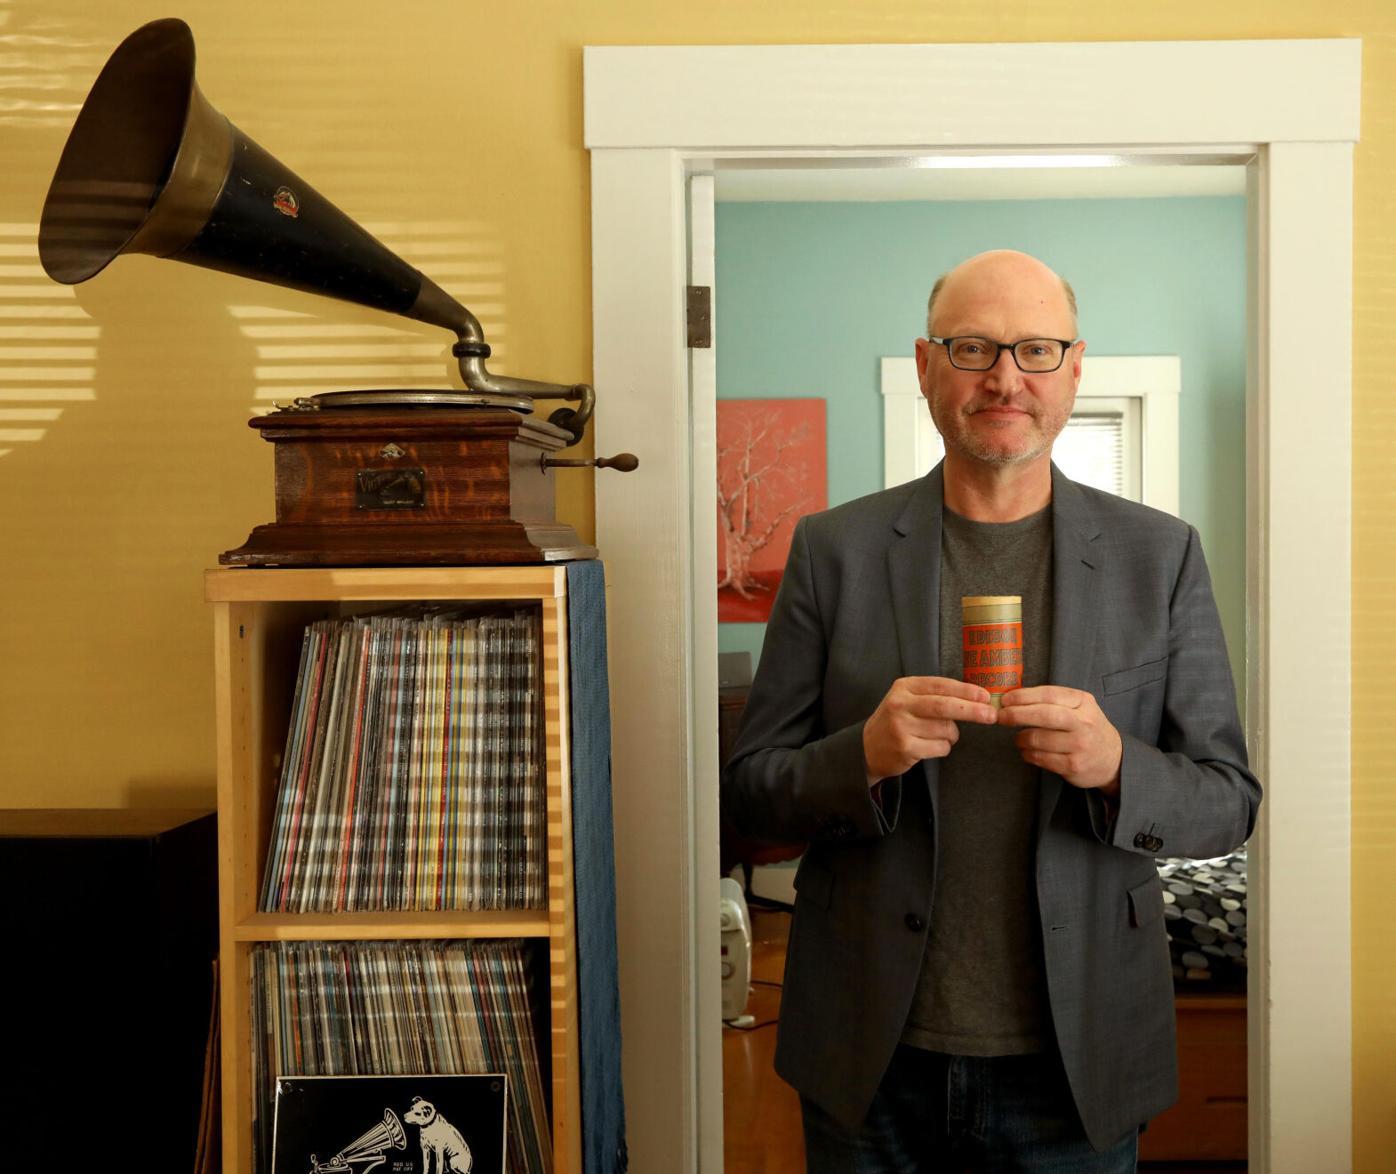 David Seubert, curator for Performing Arts Collection